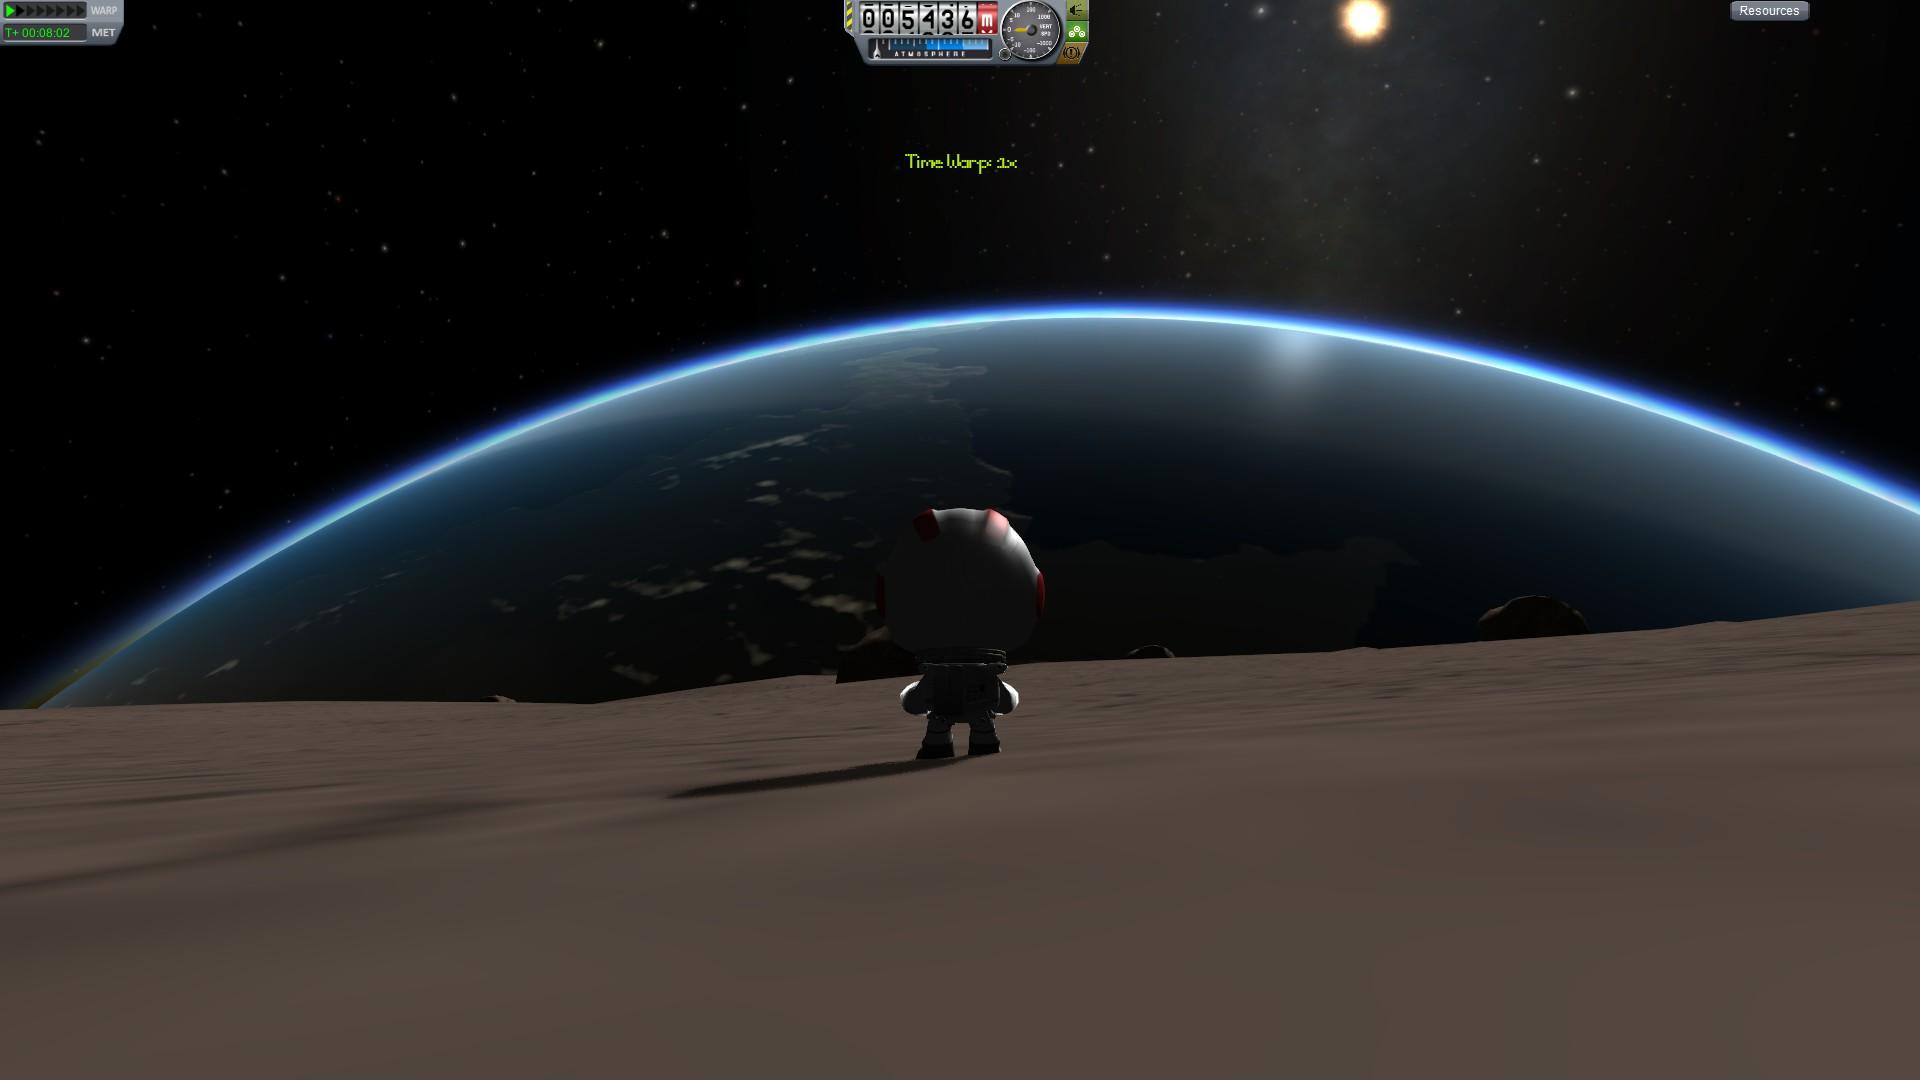 kerbal space program monolith floating - photo #9